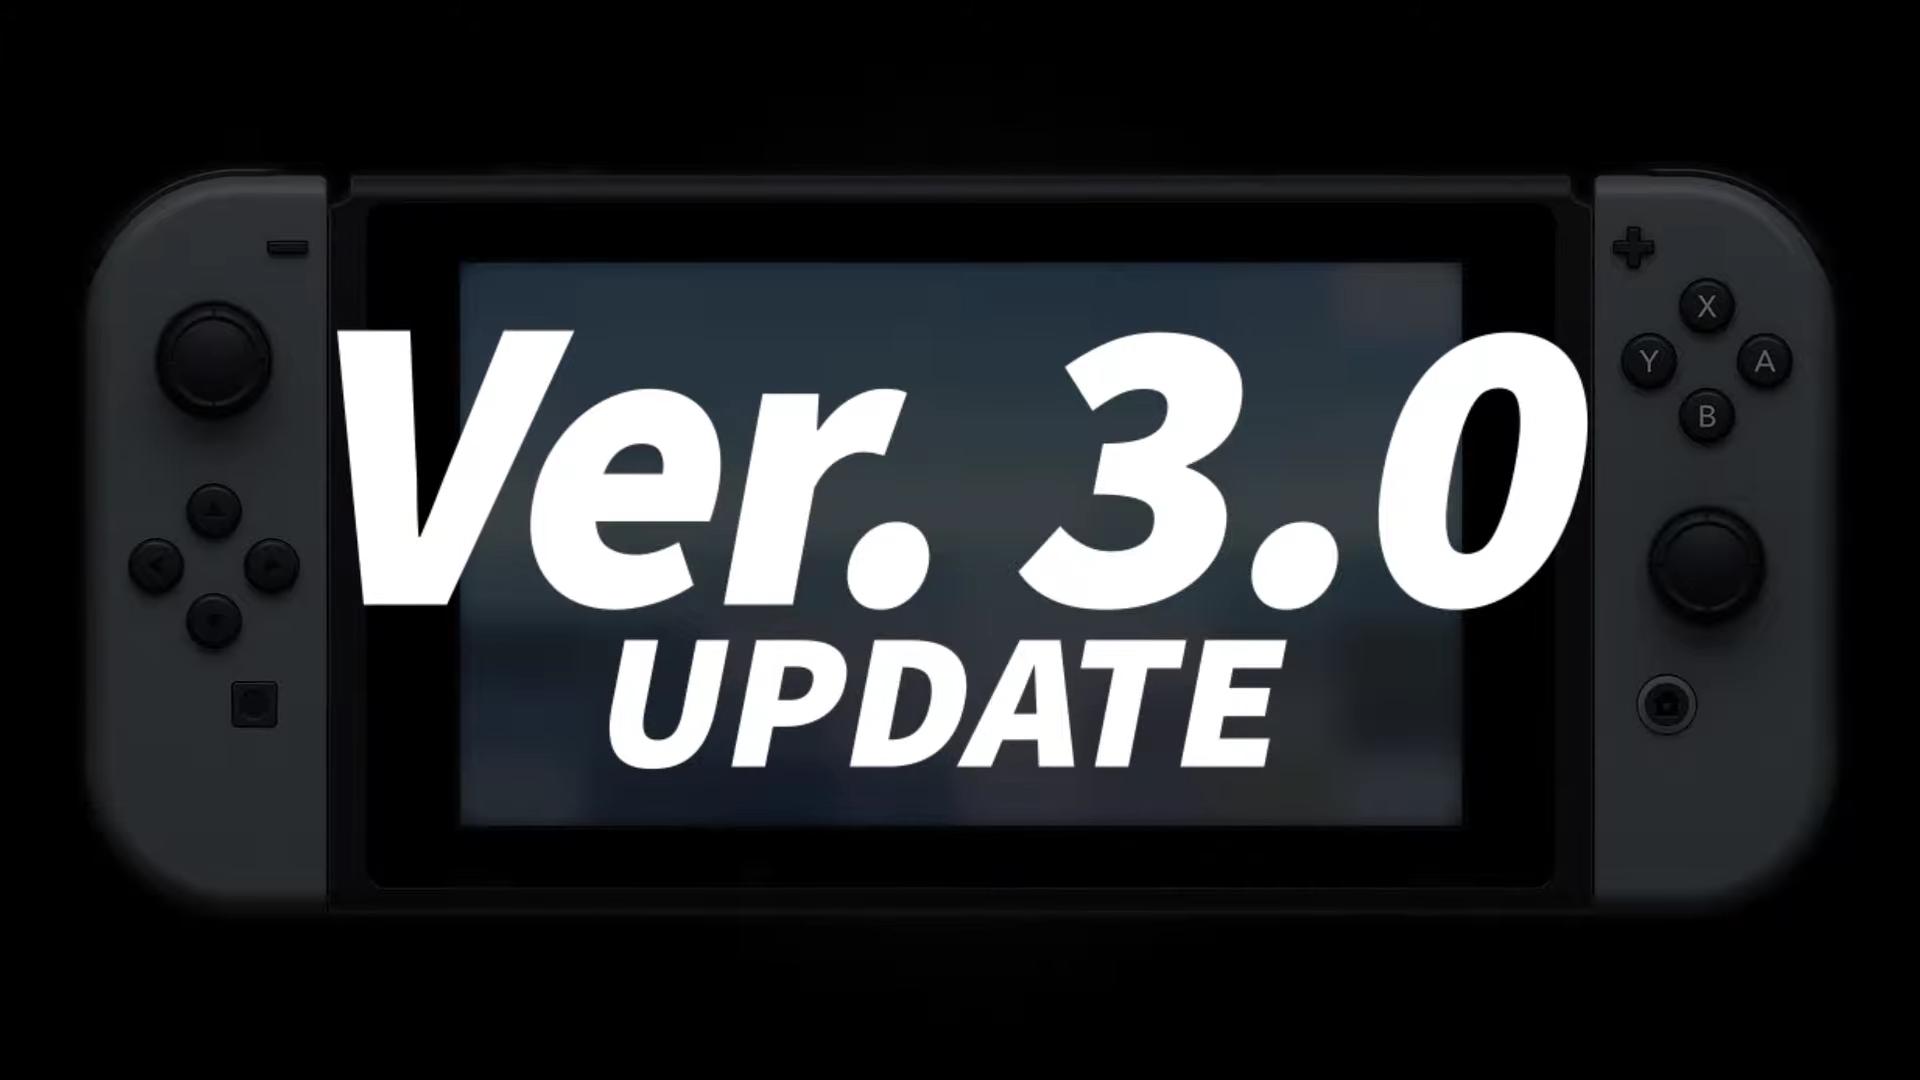 super smash bros ultimate update 3.0 not downloading